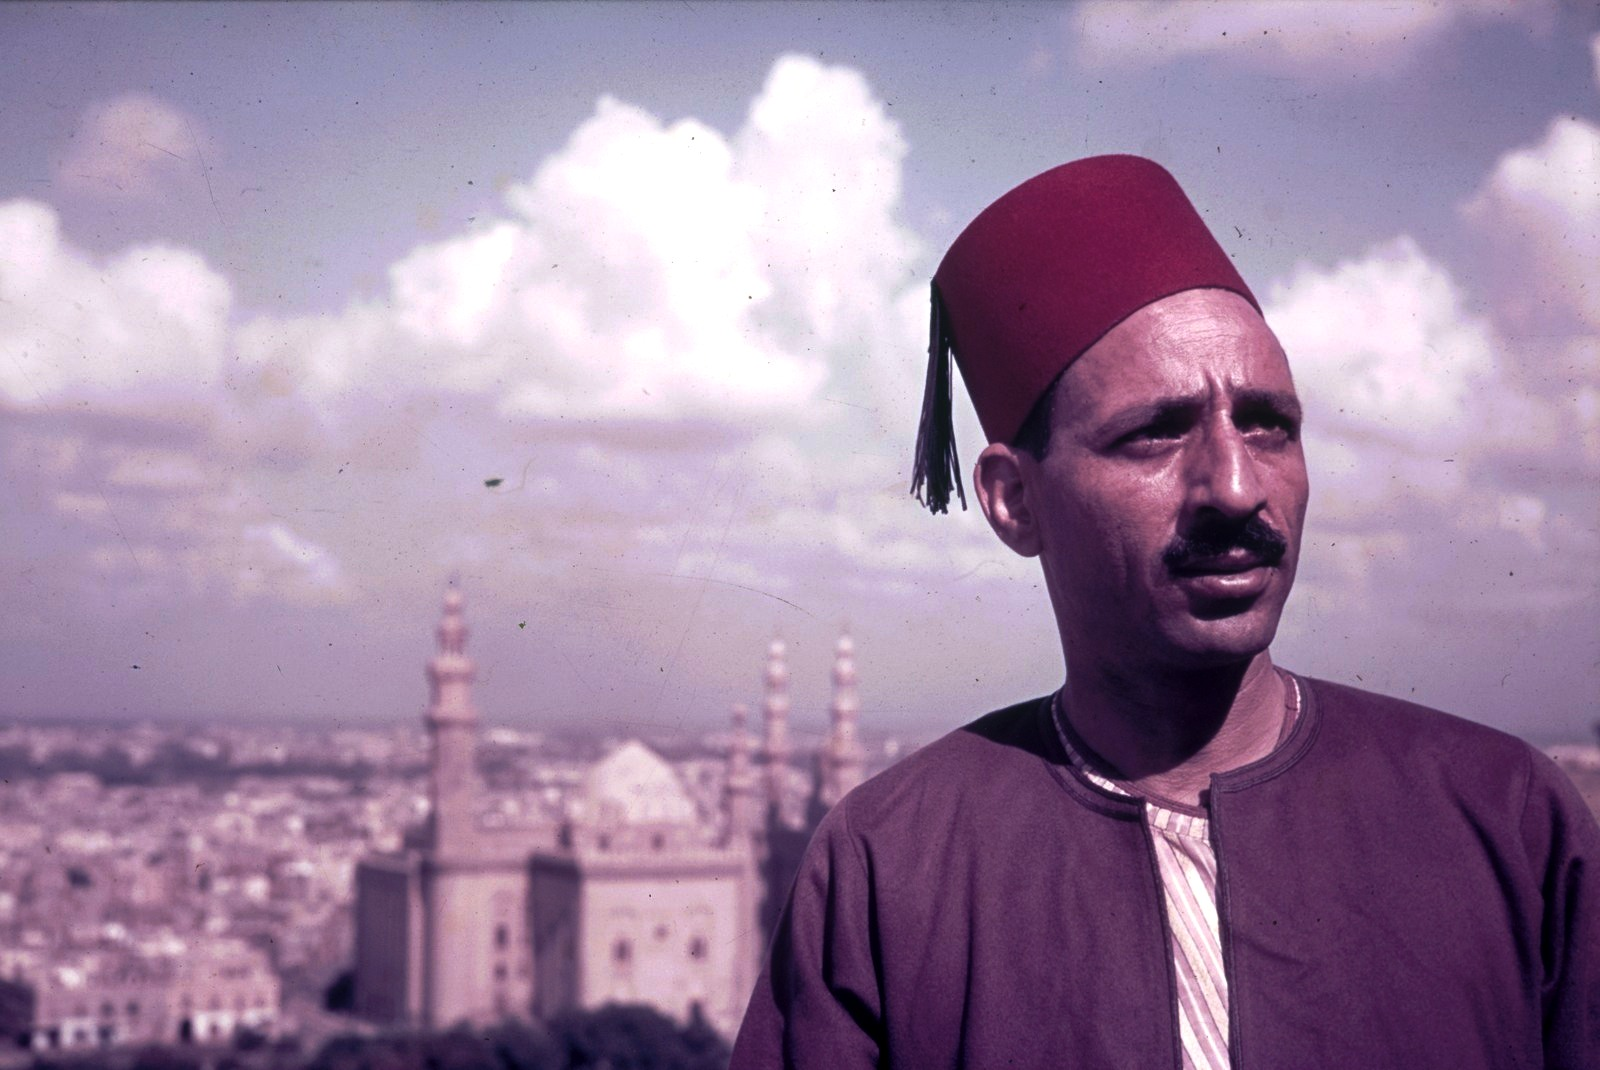 Каир. Египтянин в феске на фоне мечети Султана Хасана